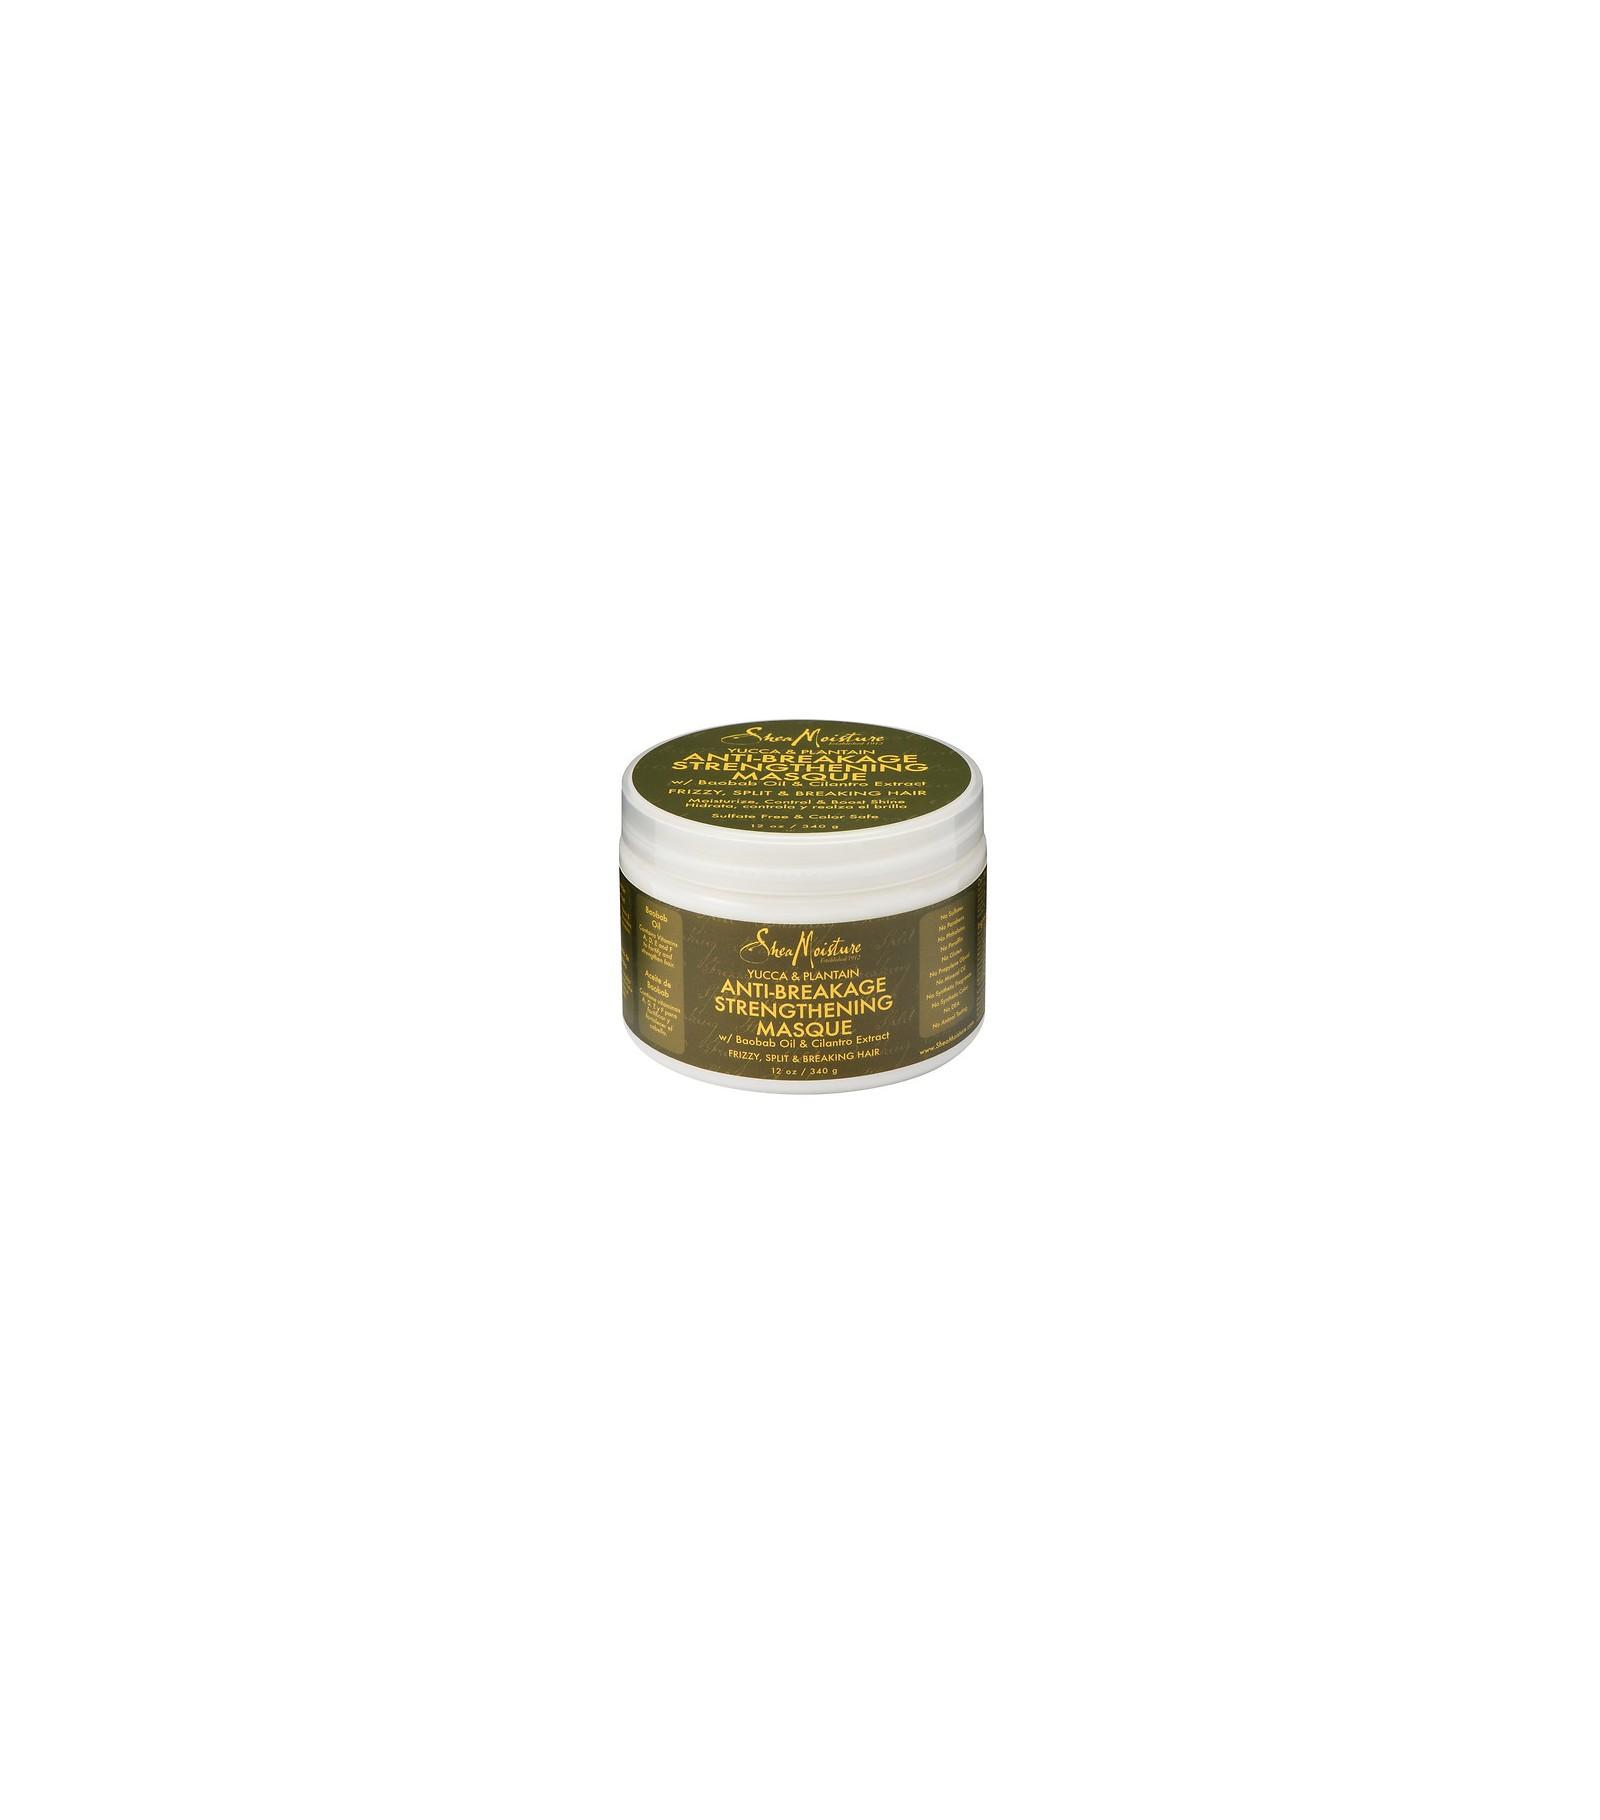 Shea Moisture Yucca & Plantain Anti-Breakage Strenthening Masque 340 g